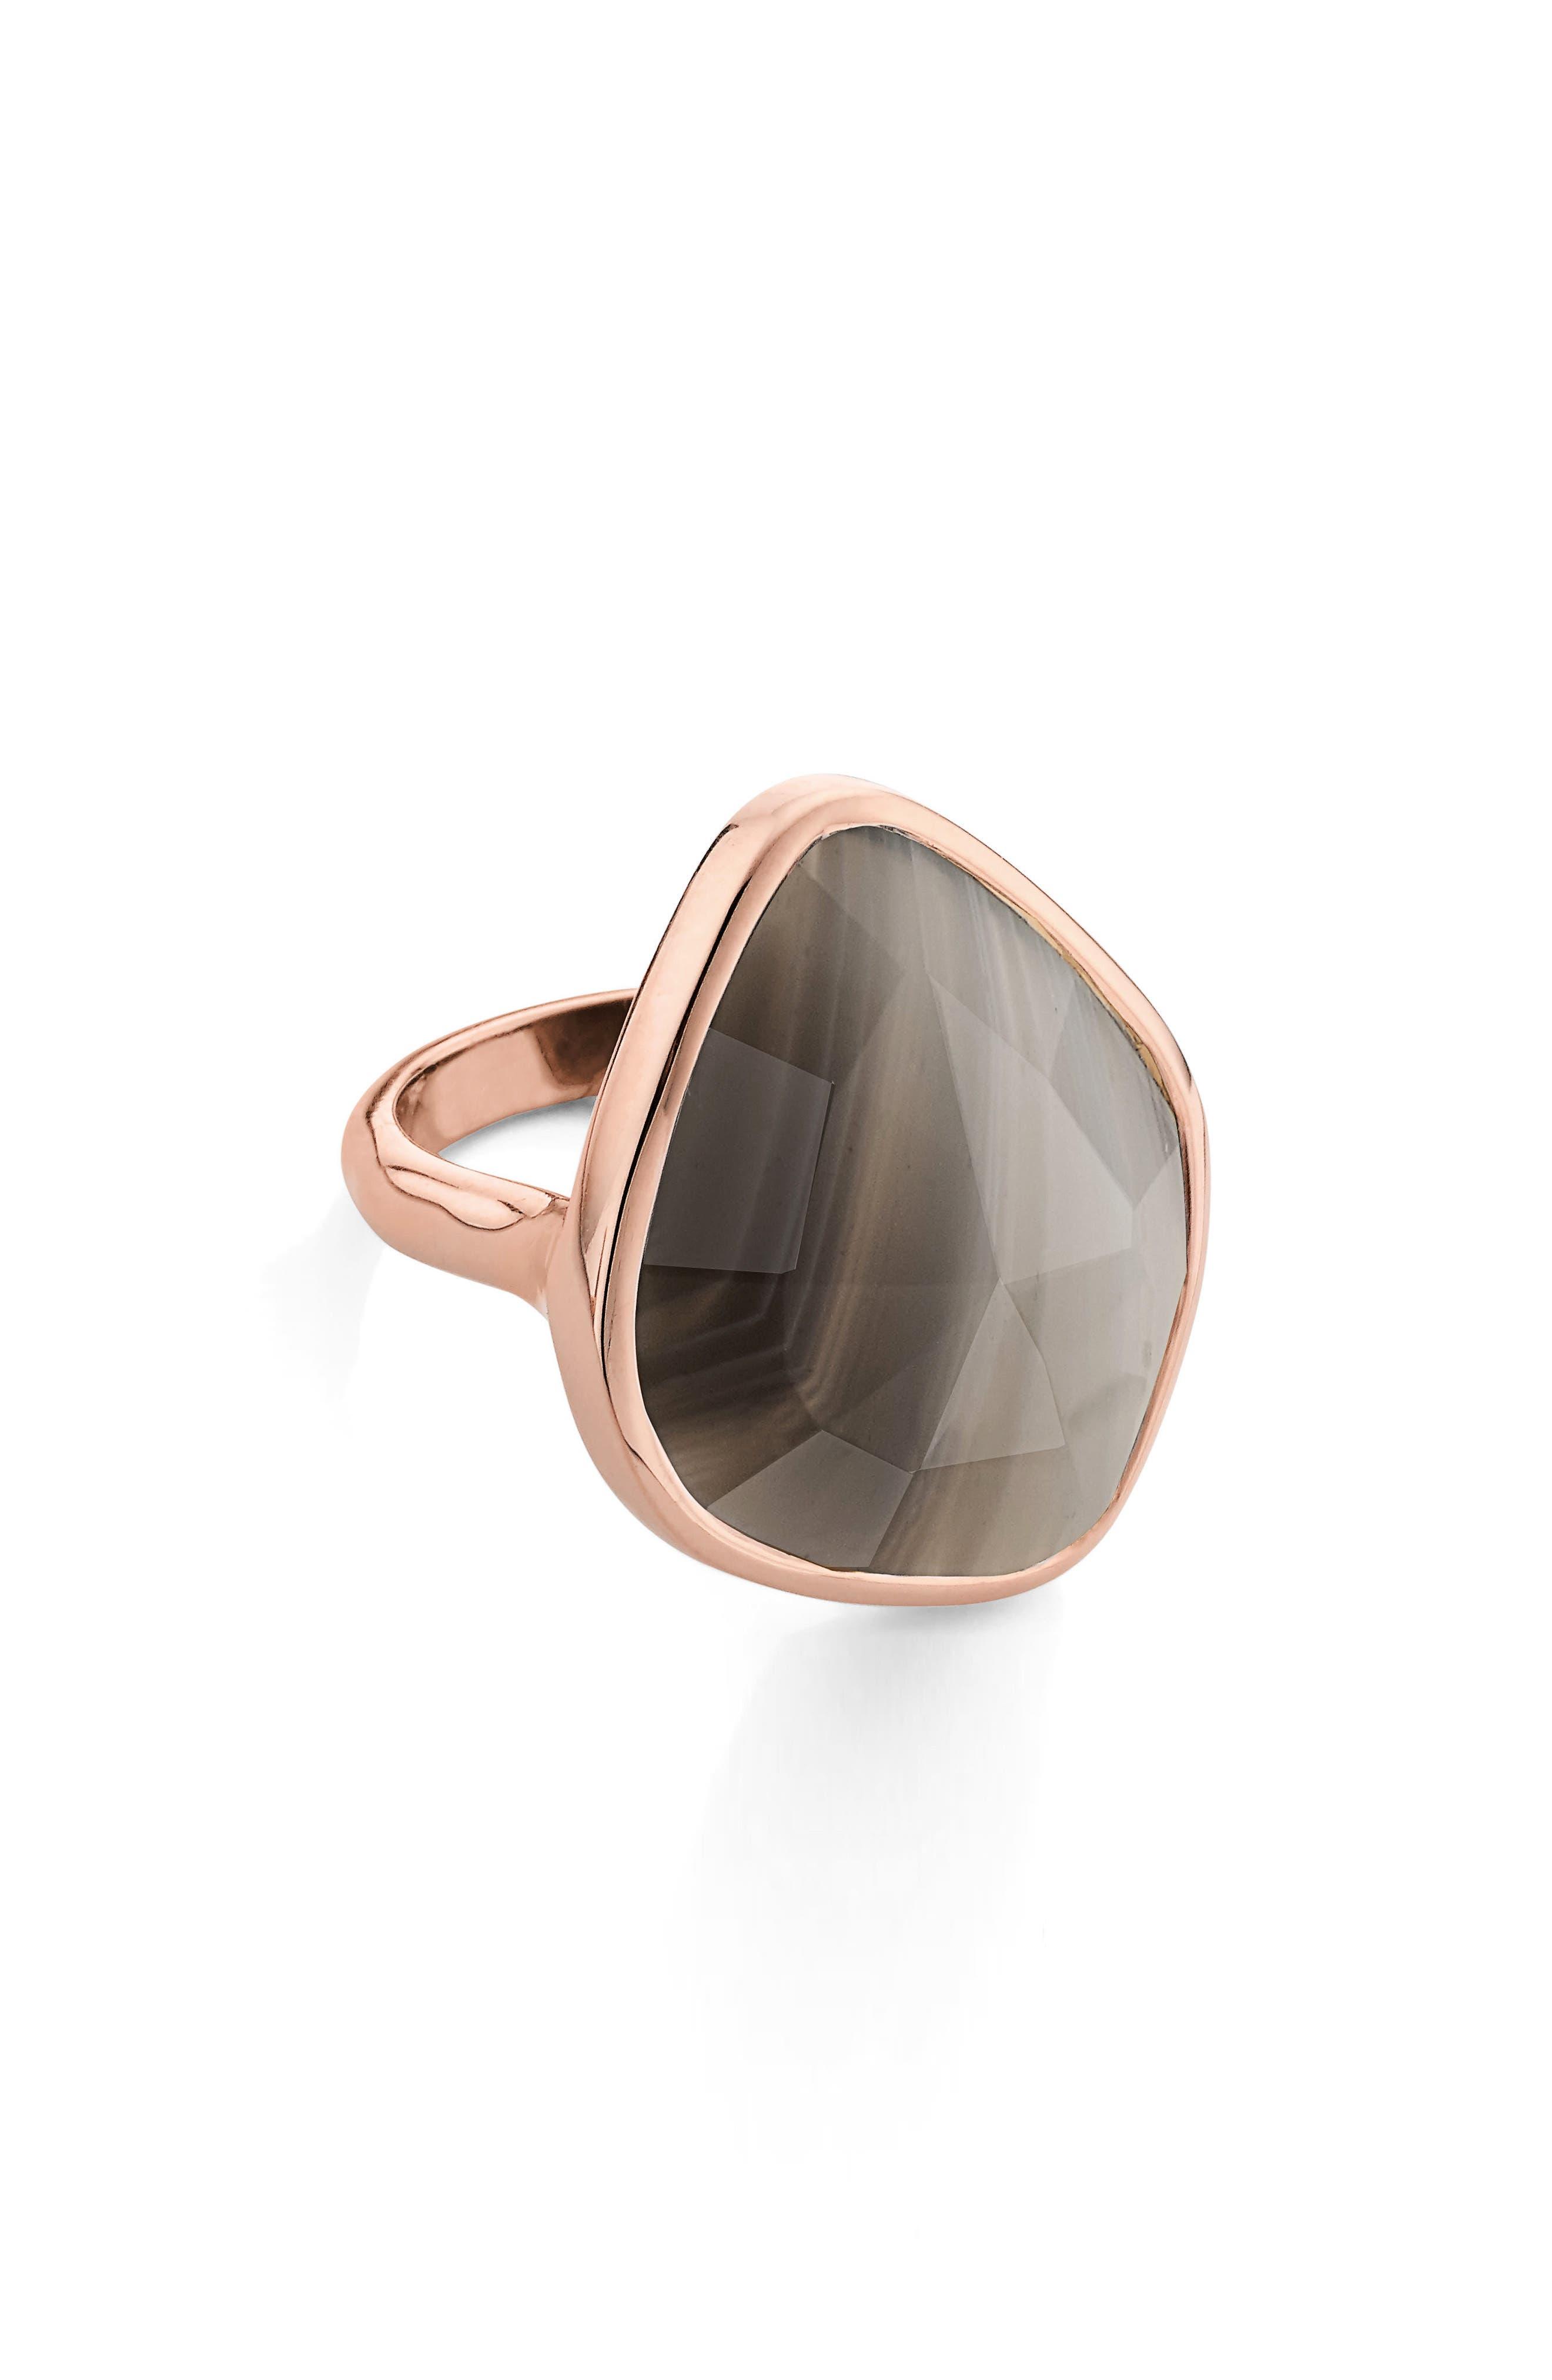 Siren Nugget Semiprecious Stone Ring,                             Alternate thumbnail 3, color,                             Grey Agate/ Rose Gold